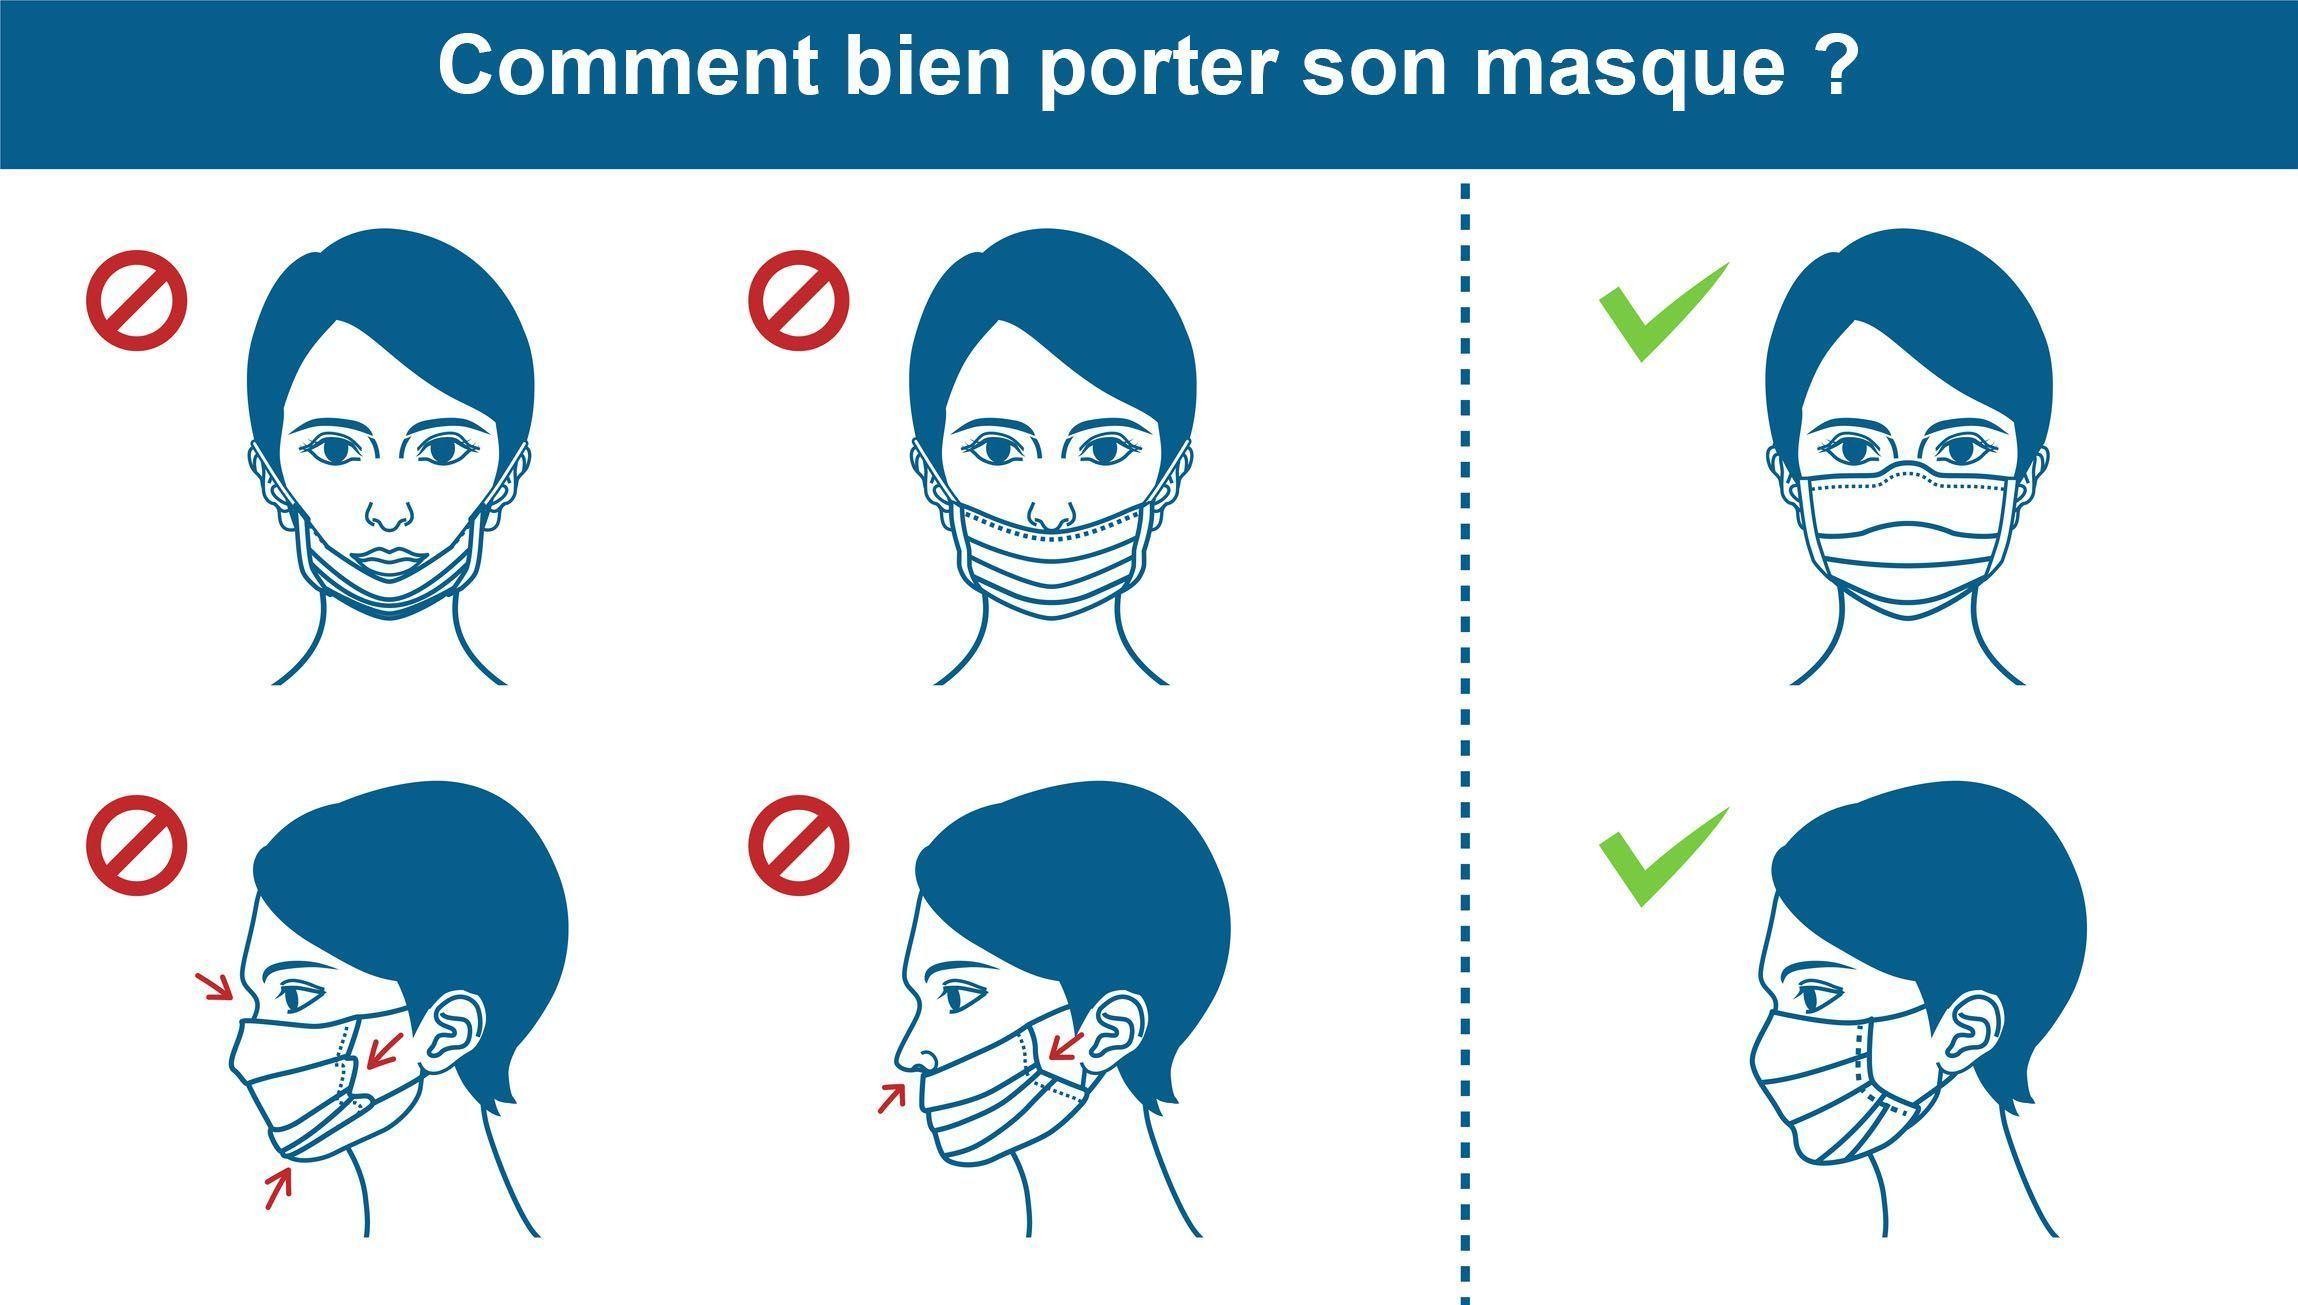 porter-masque